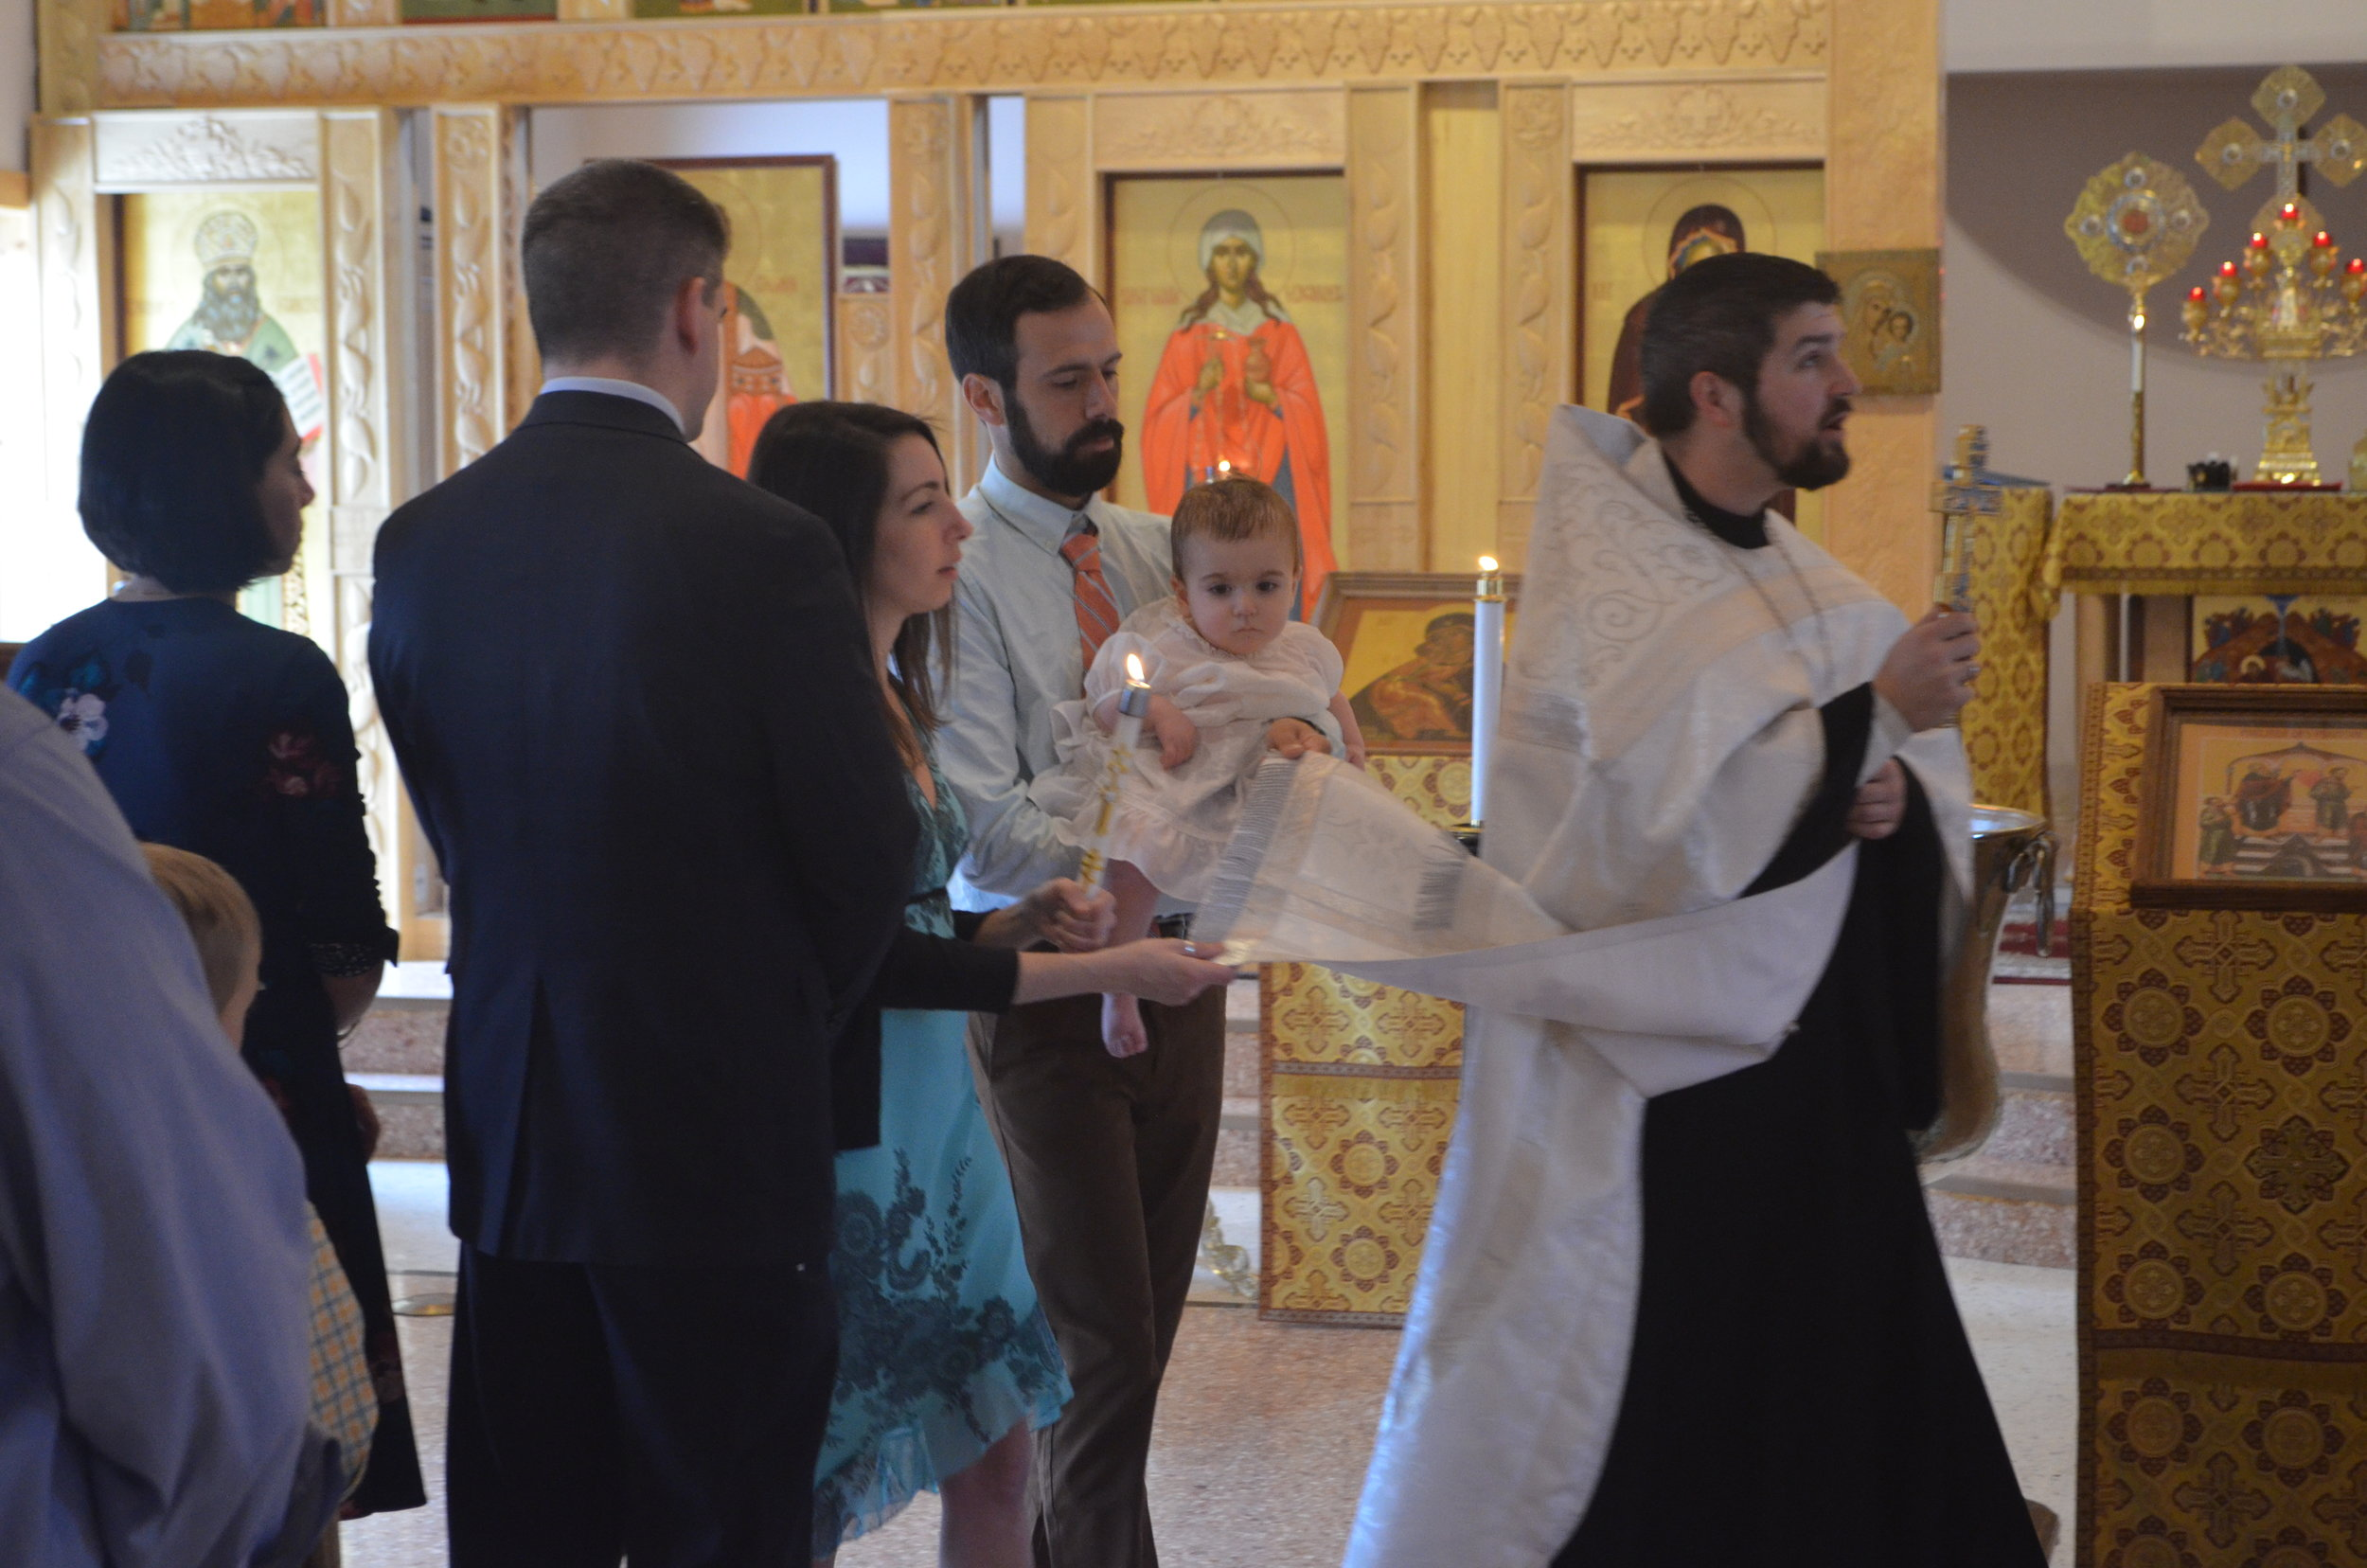 WEW baptism 2 2019 processional.JPG